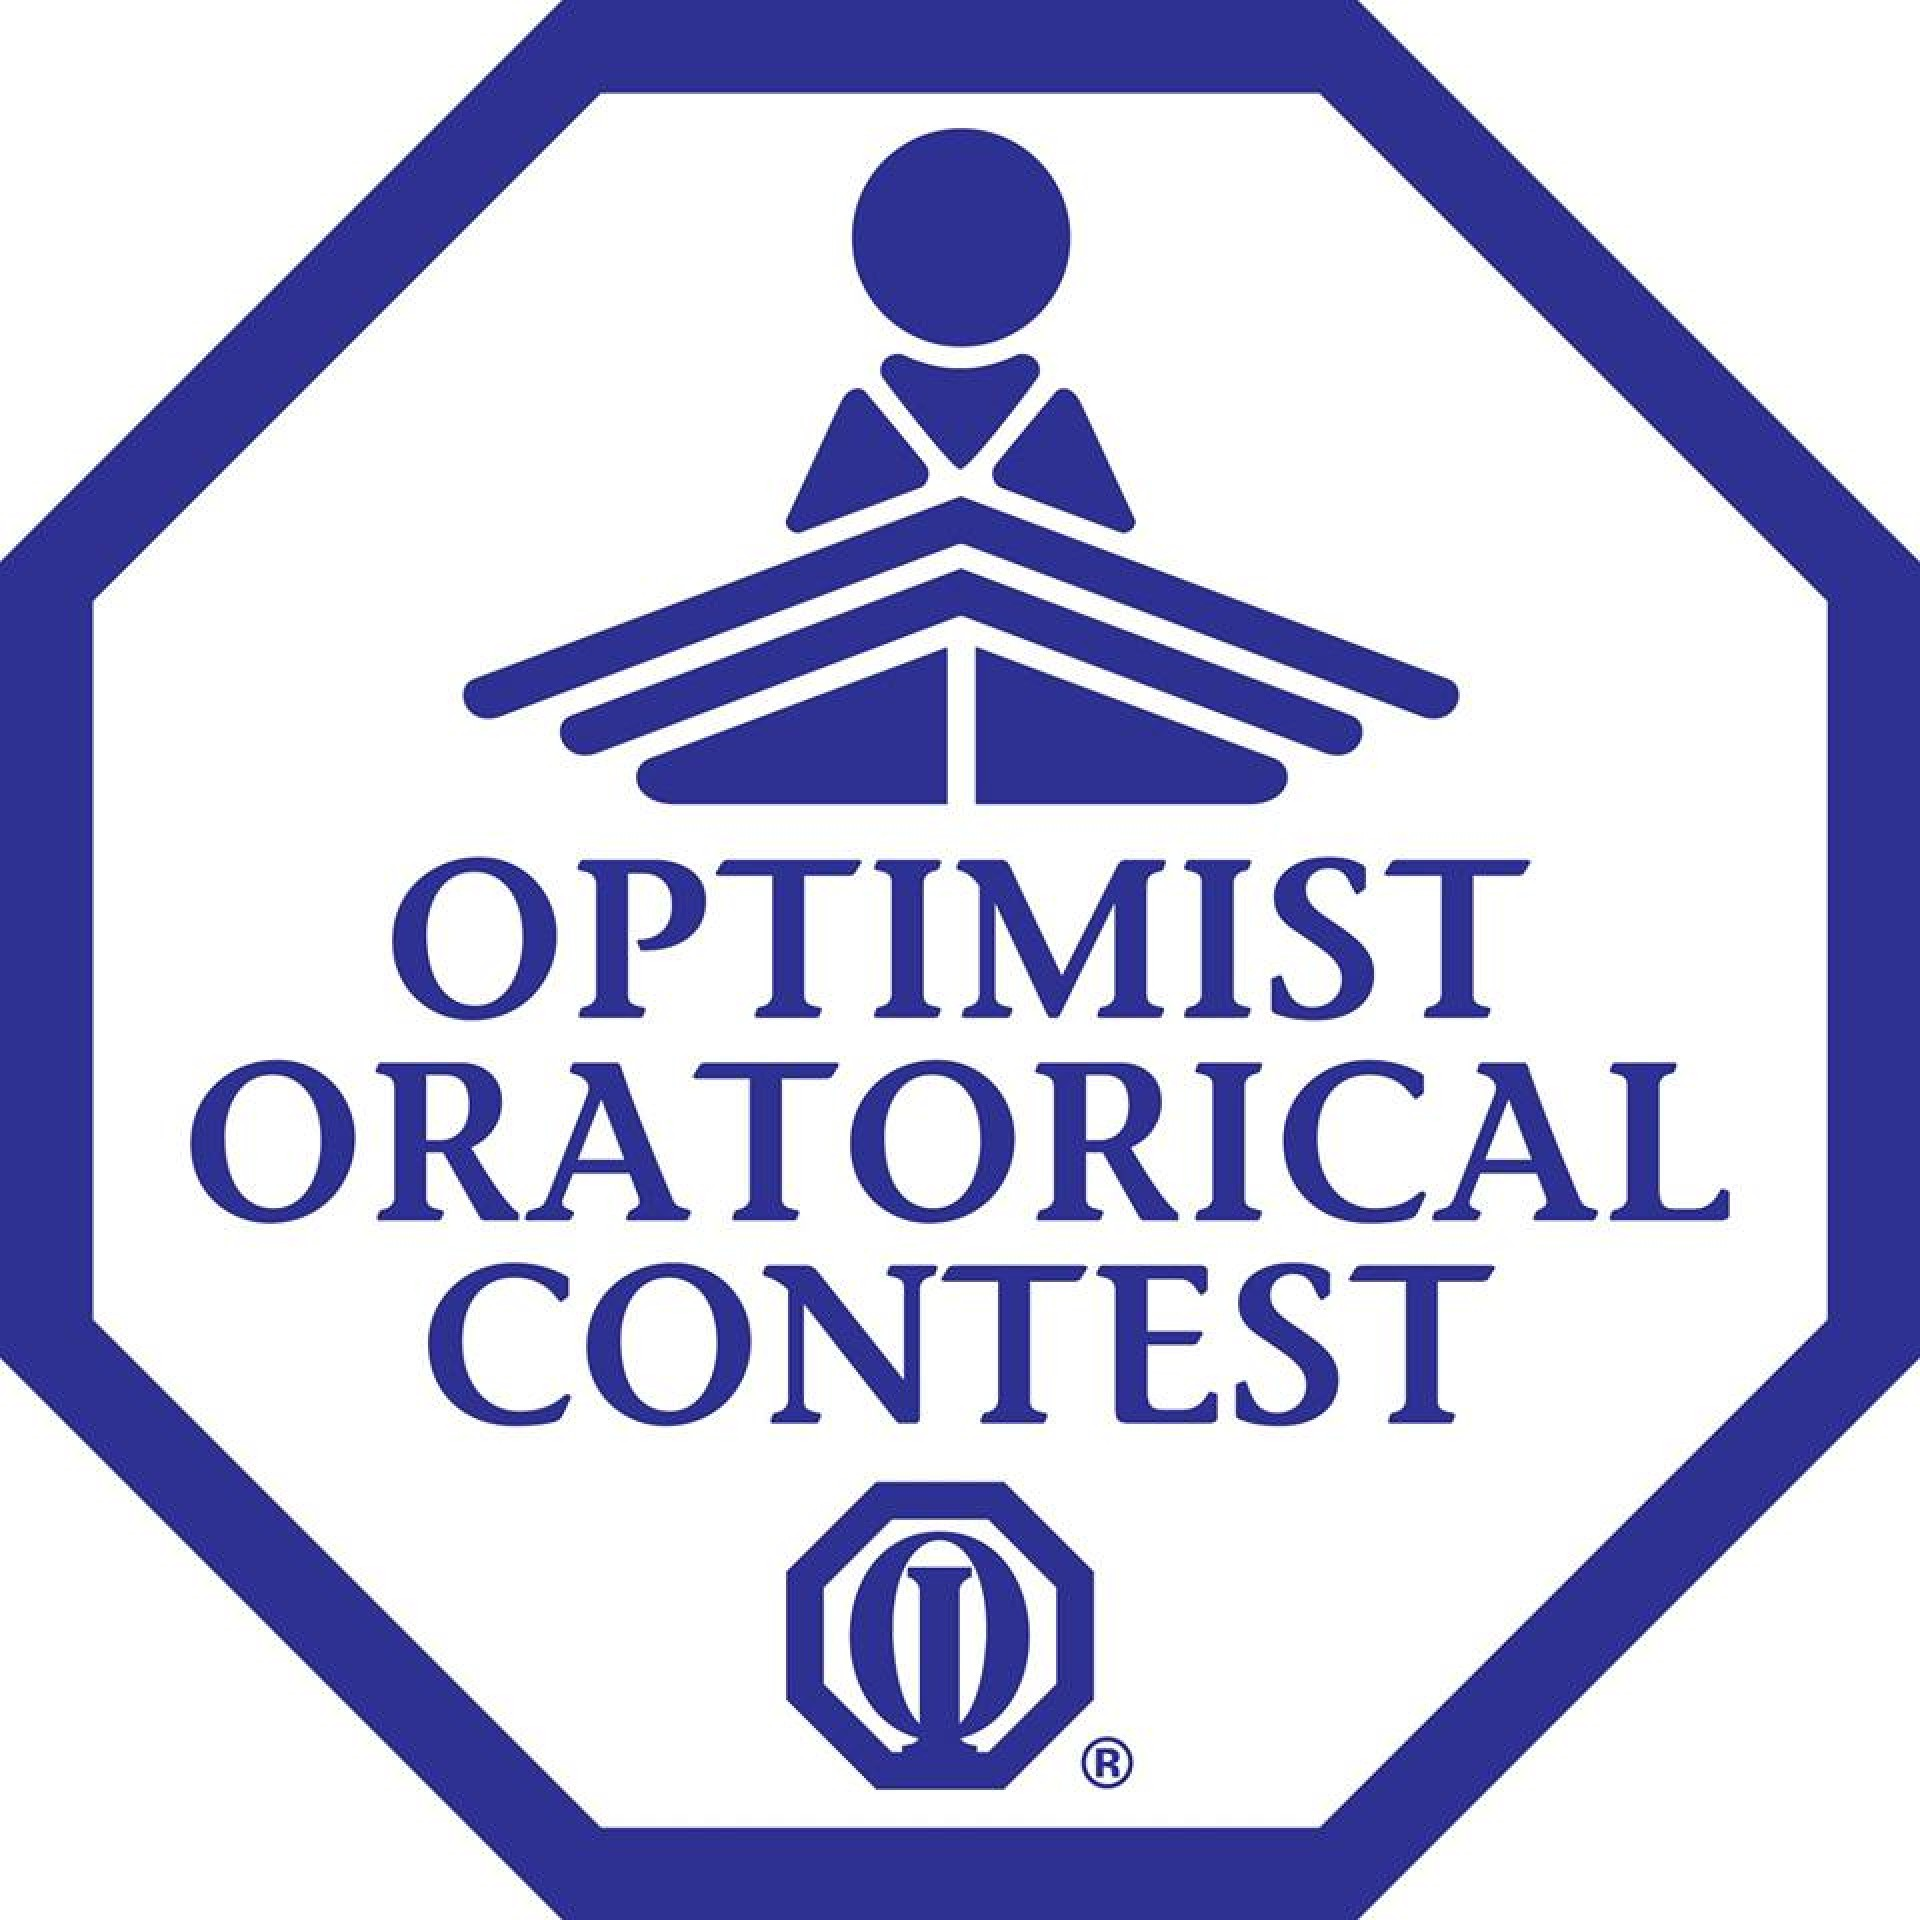 003 Oratorical20contest Optimist International Essay Contest Wondrous Winners Due Date Oratorical 1920